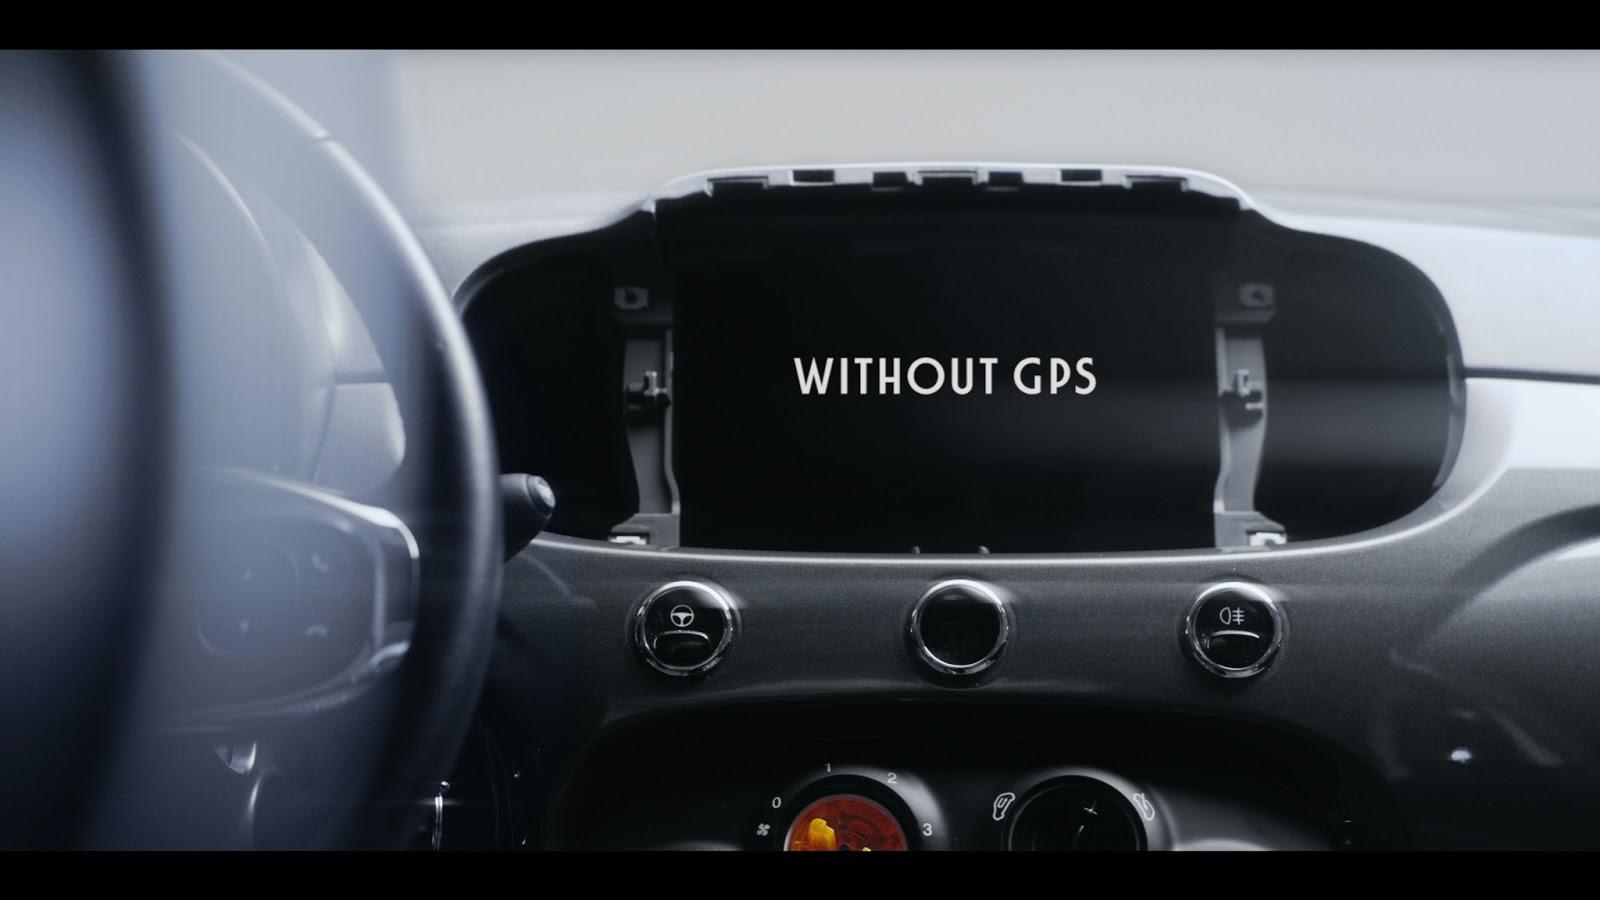 170307 Fiat GPS ENG Χωρίς τις γυναικείες εφευρέσεις, τα αυτοκίνητα θα ηταν φτωχότερα Fiat, Fiat 500, videos, woman